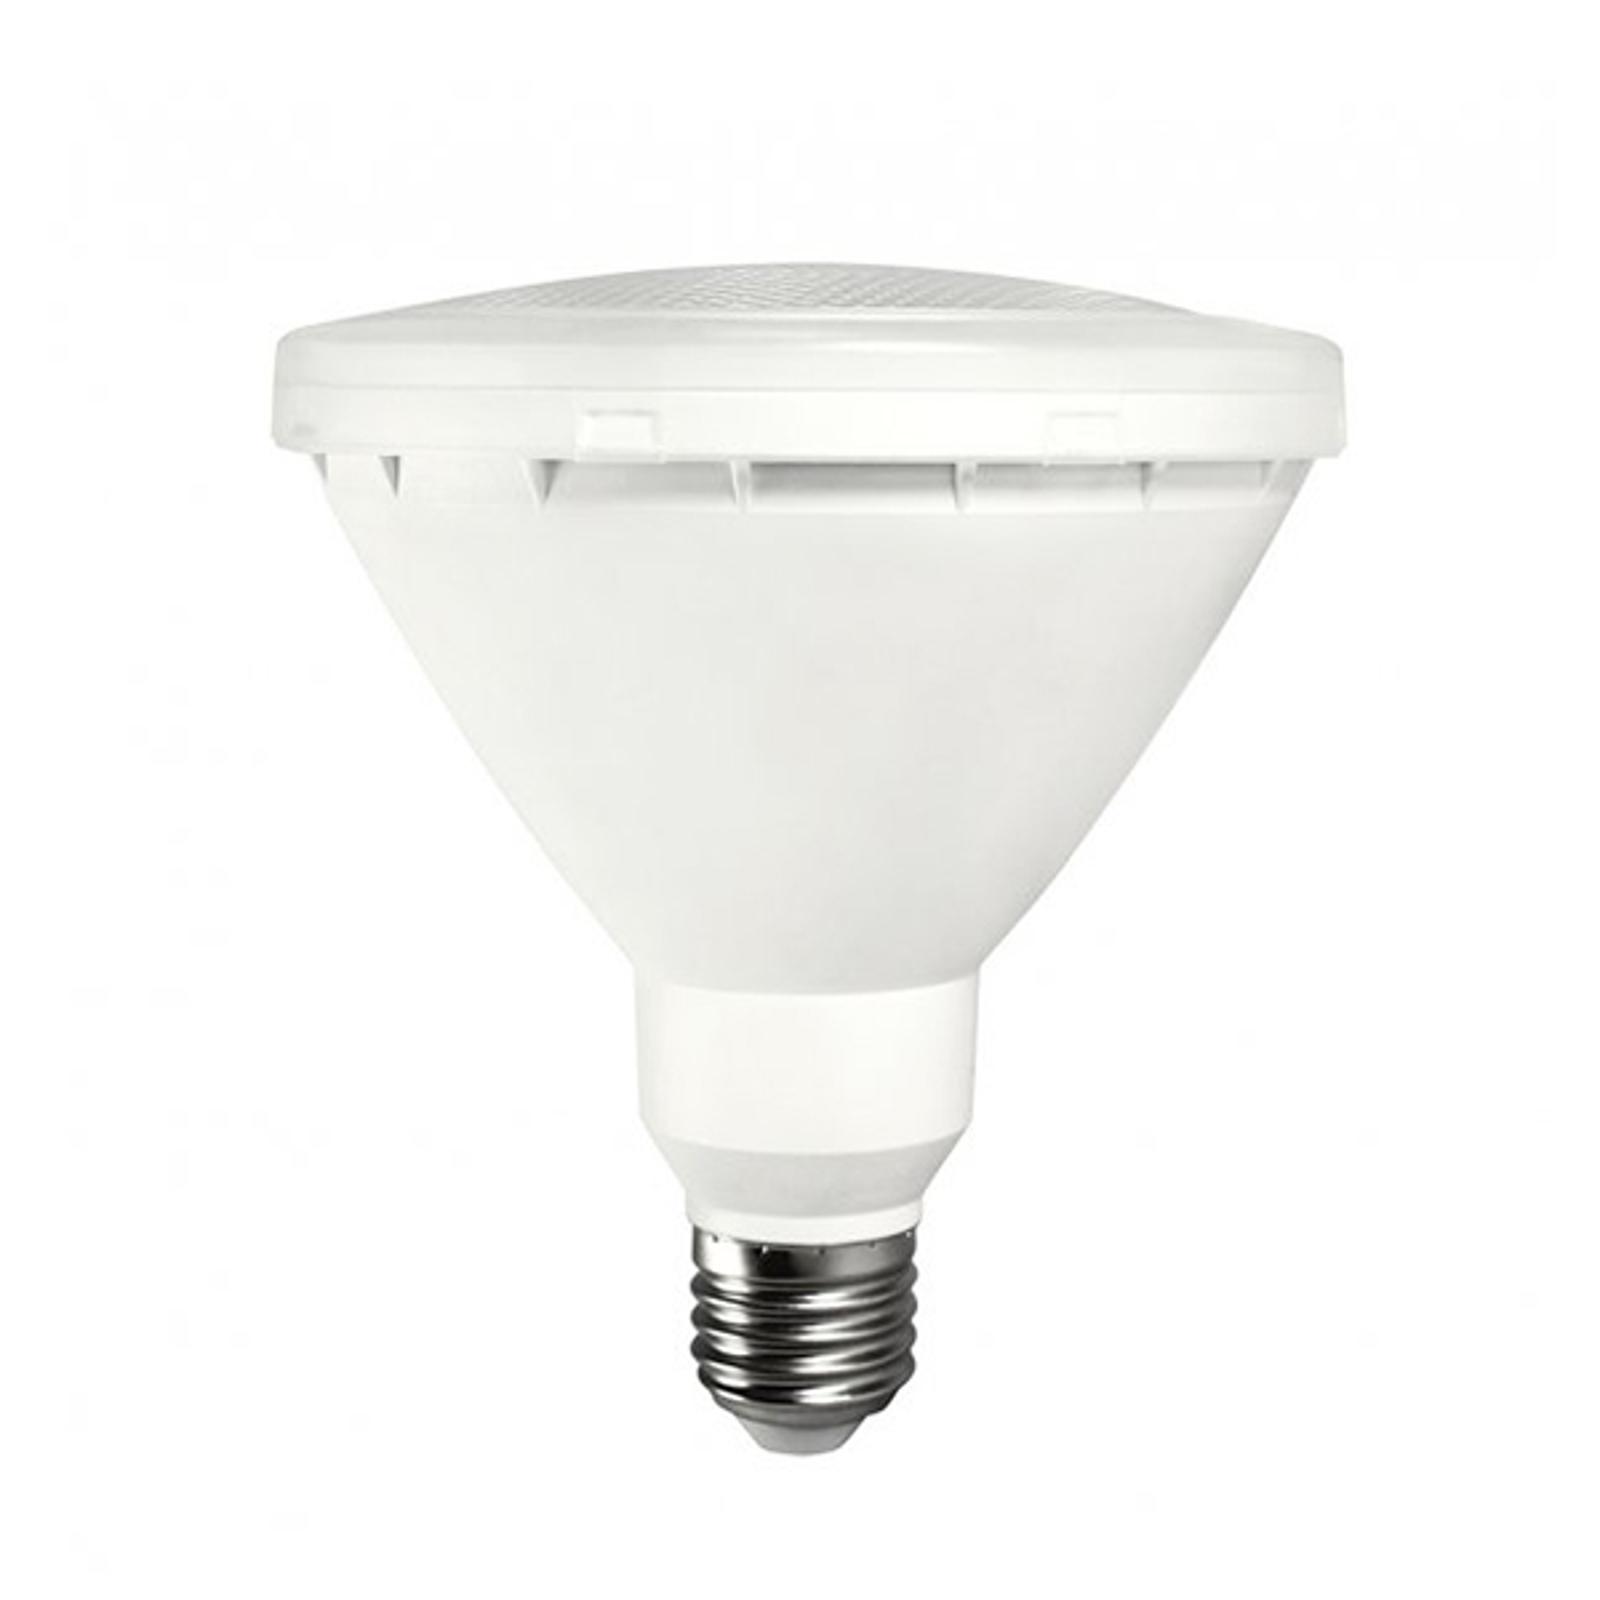 Reflector LED RODER PAR38 E27 15 W 827 impermeable